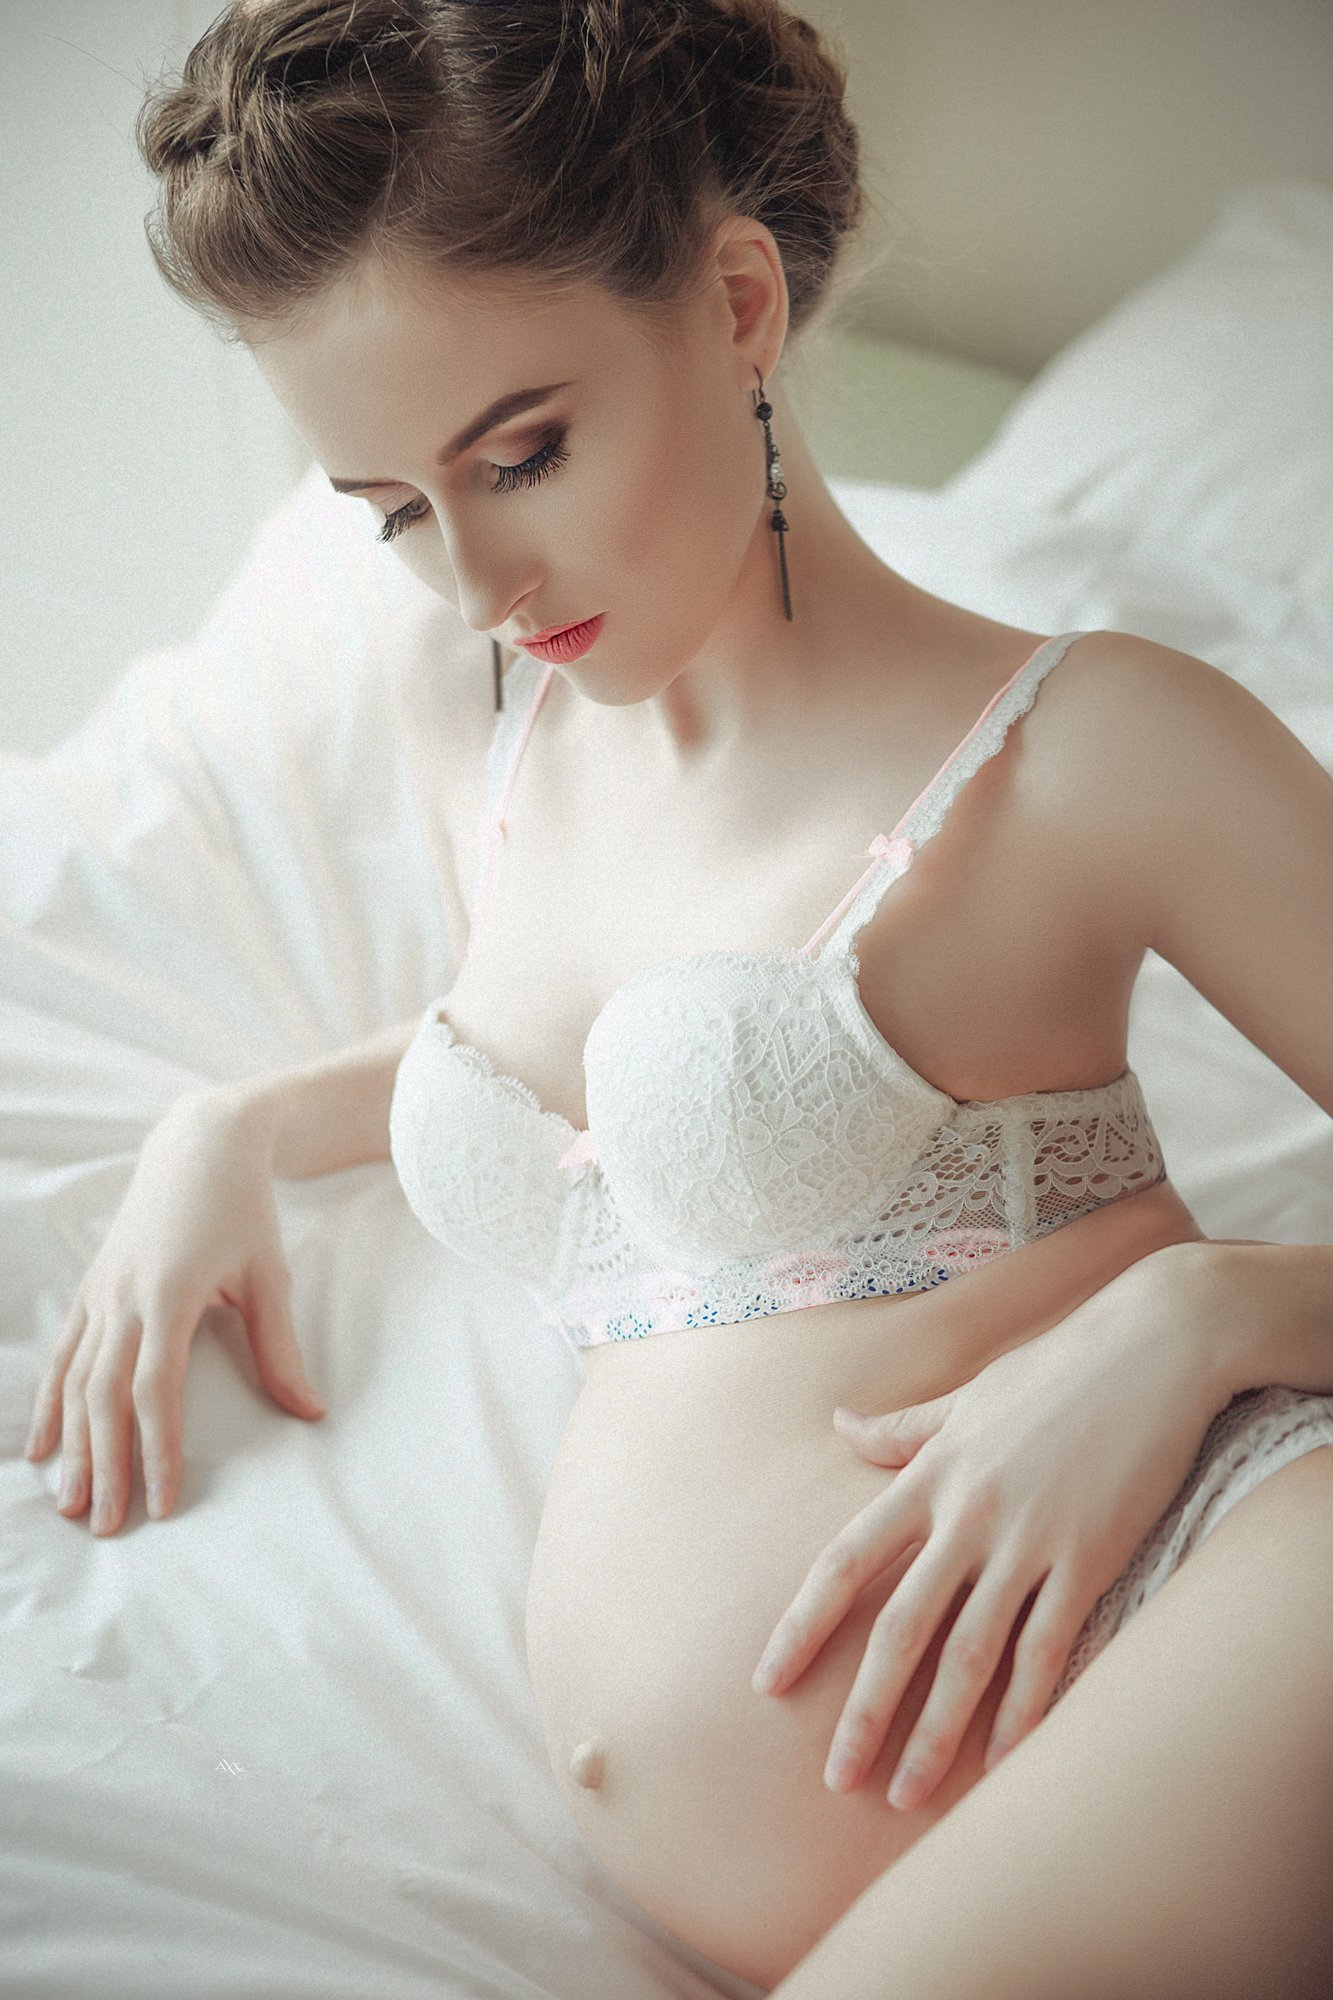 woman, art, portrait, beauty, pregnancy, indoors, natural light, Руслан Болгов (Axe)